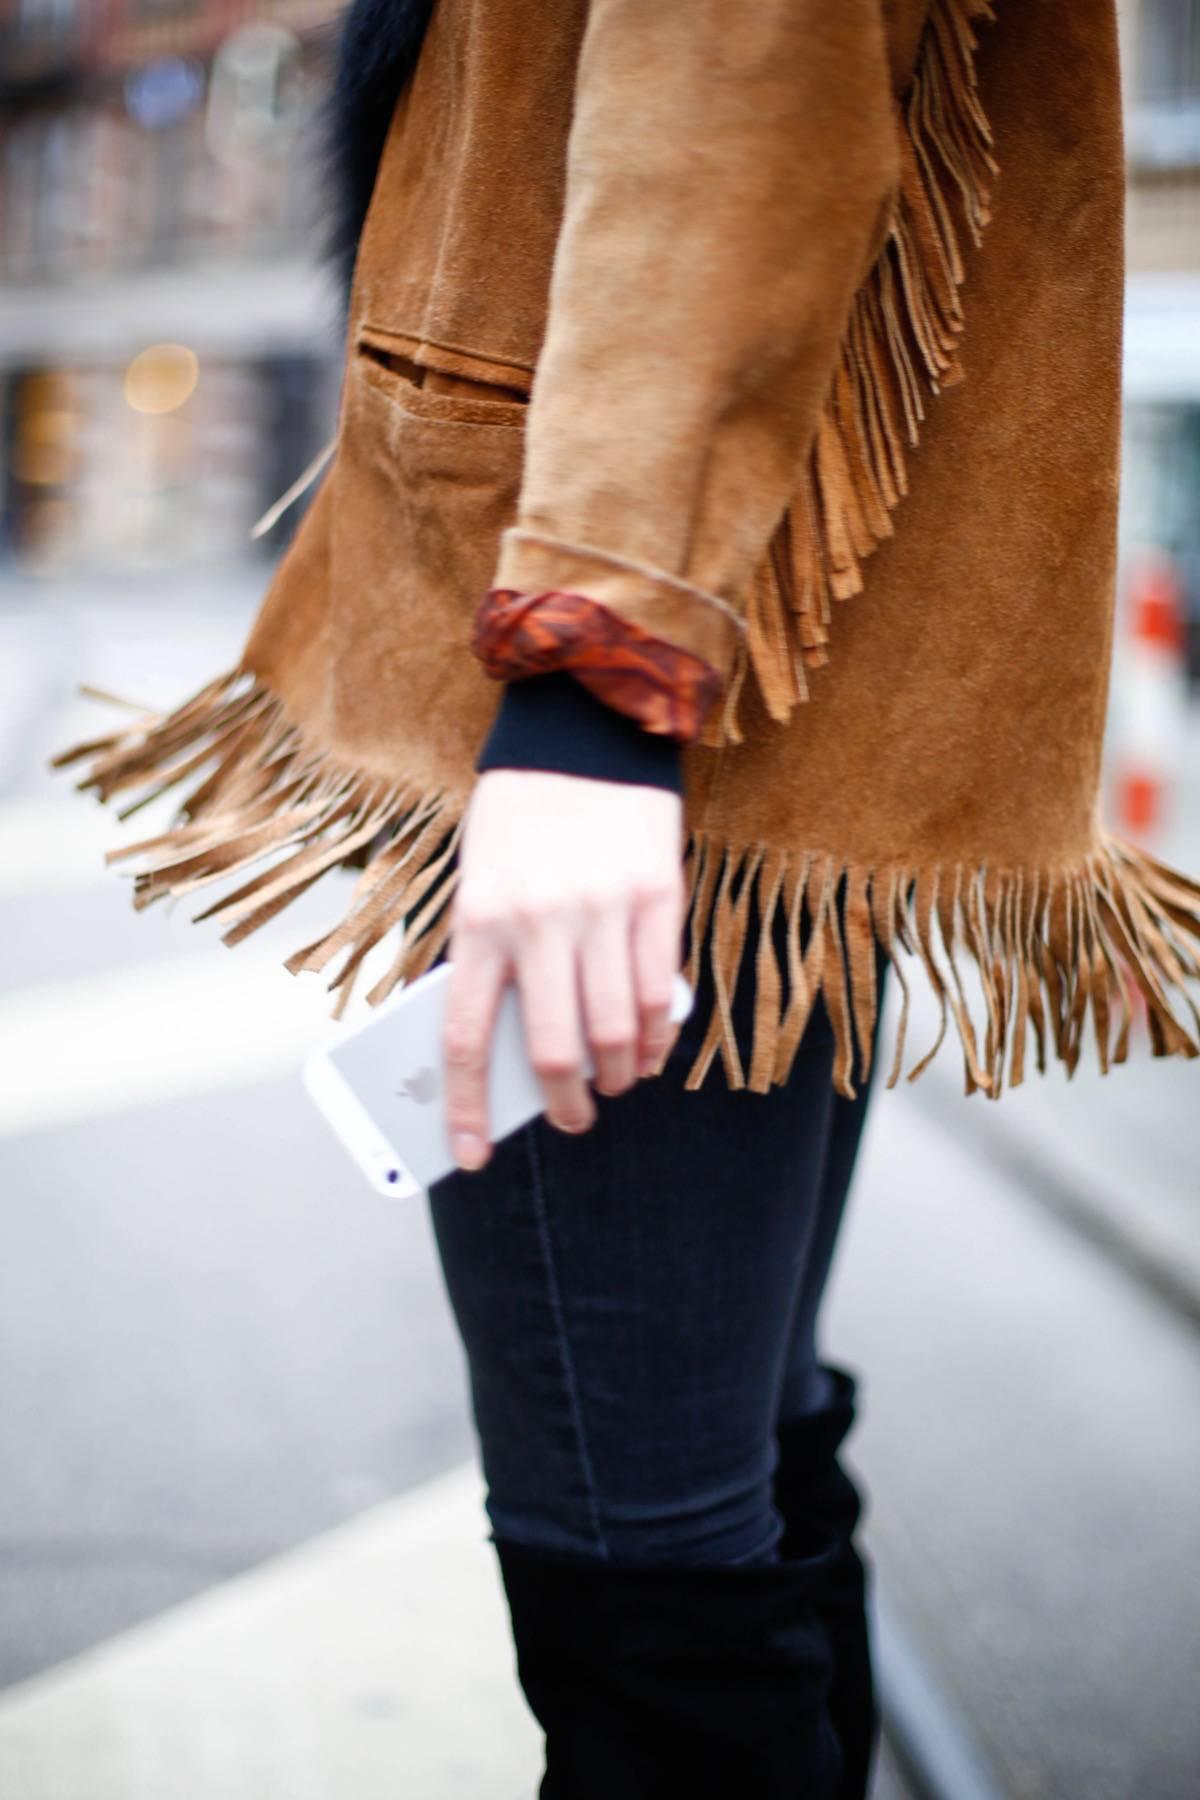 Fringed Jacket - Suede Leather - Vintage - Luxury - Overknees - Fur - Calvin Klein Sunnies - Fashionista - German Fashionblogger - Ootd - Streetstyle Munich - München Personal Style Blog - Isartor - Trends 2016